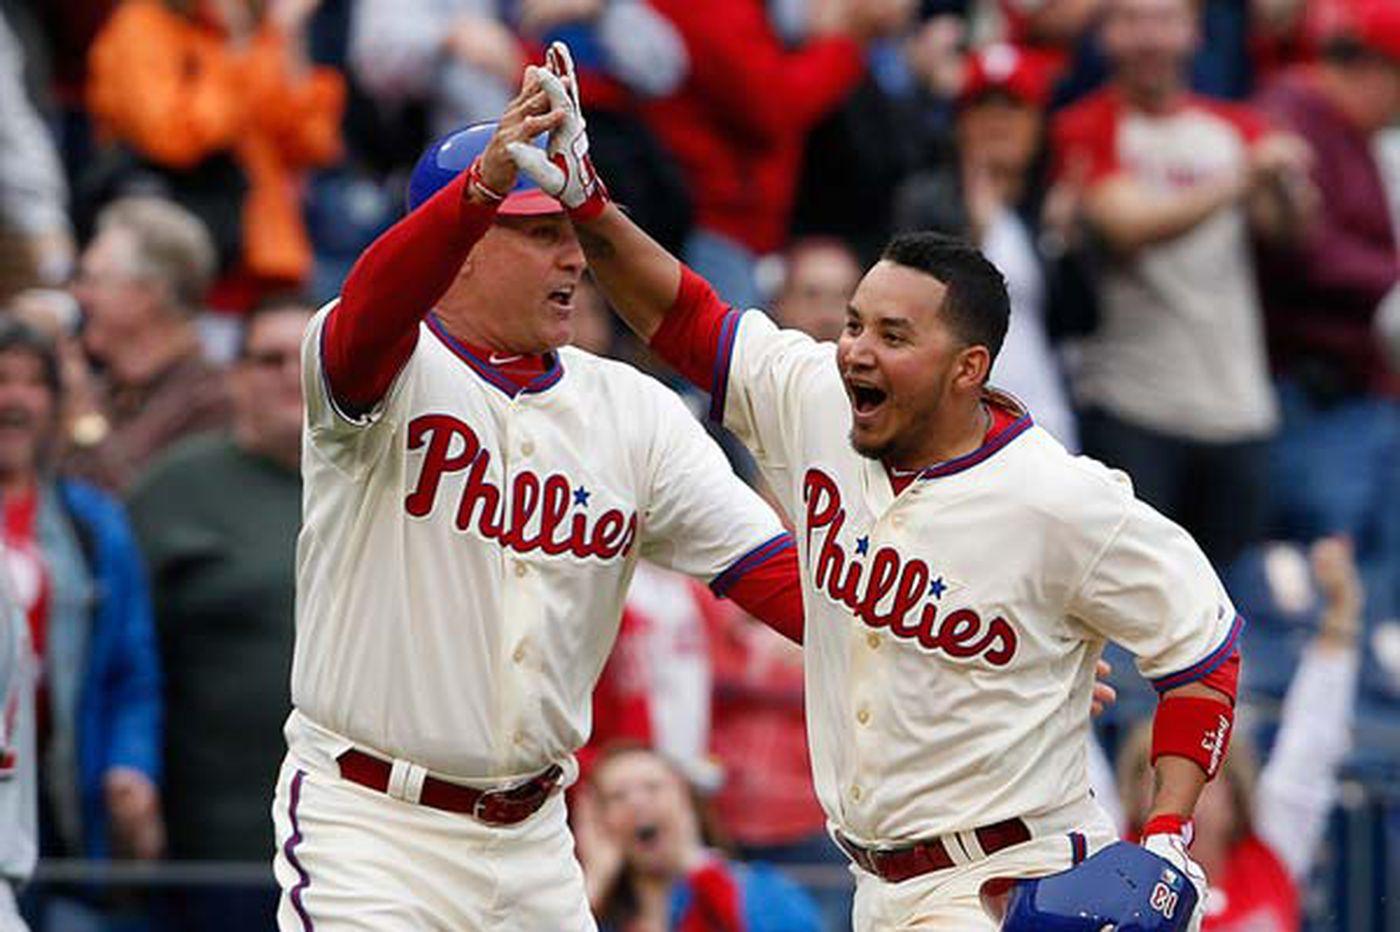 Phils stun Reds with wild ninth inning